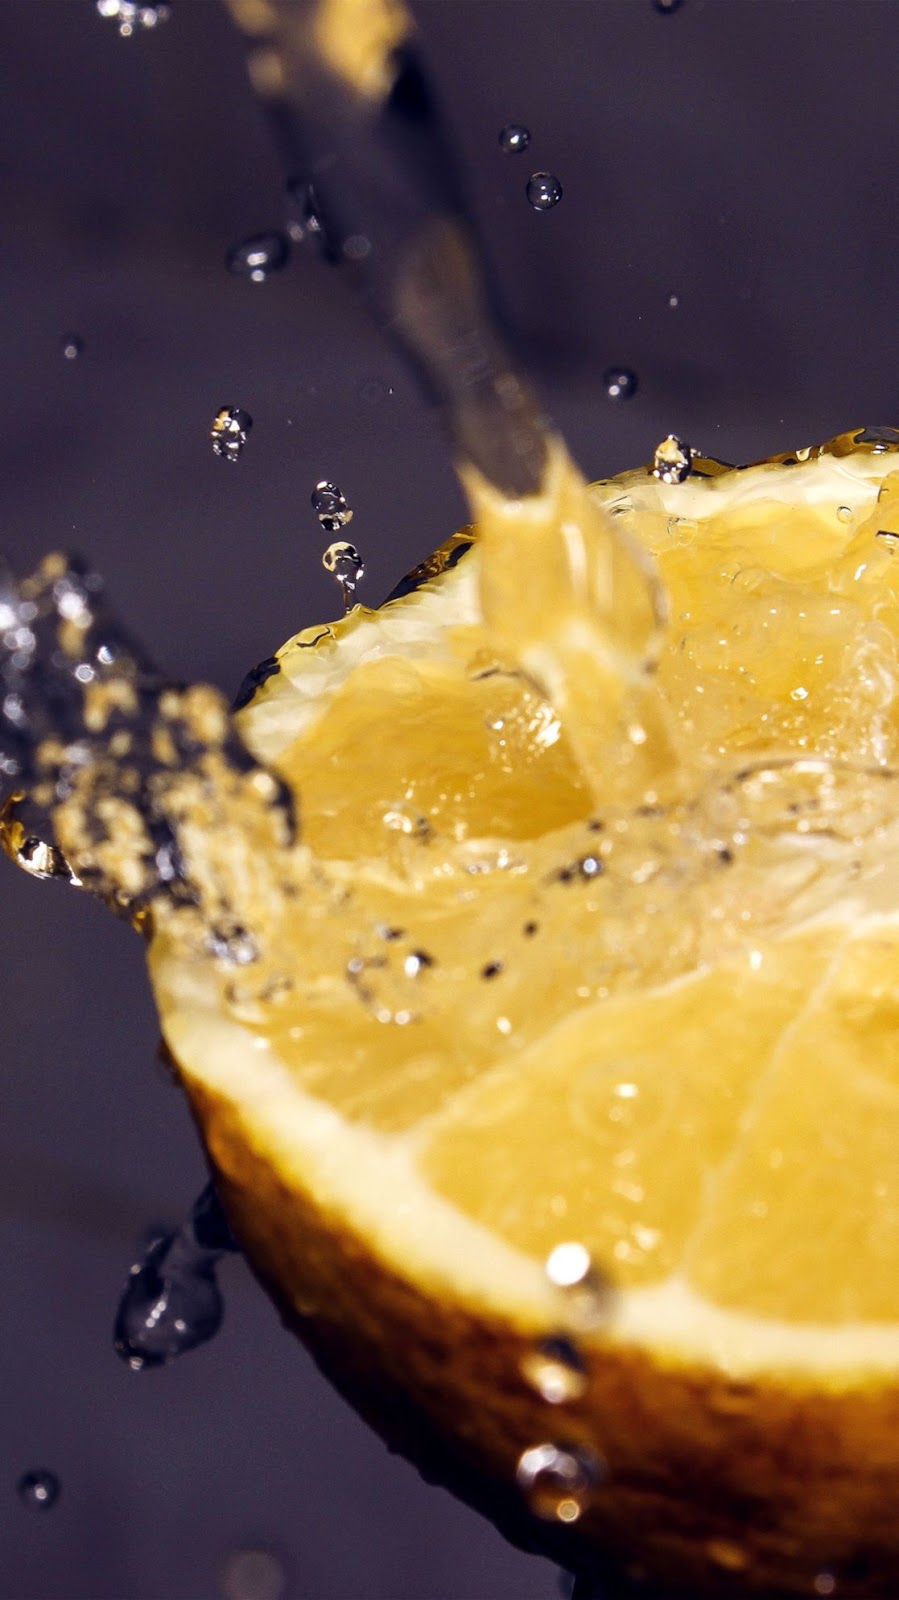 Water Fruit Lemon Wallpaper Hd Wallpapers World